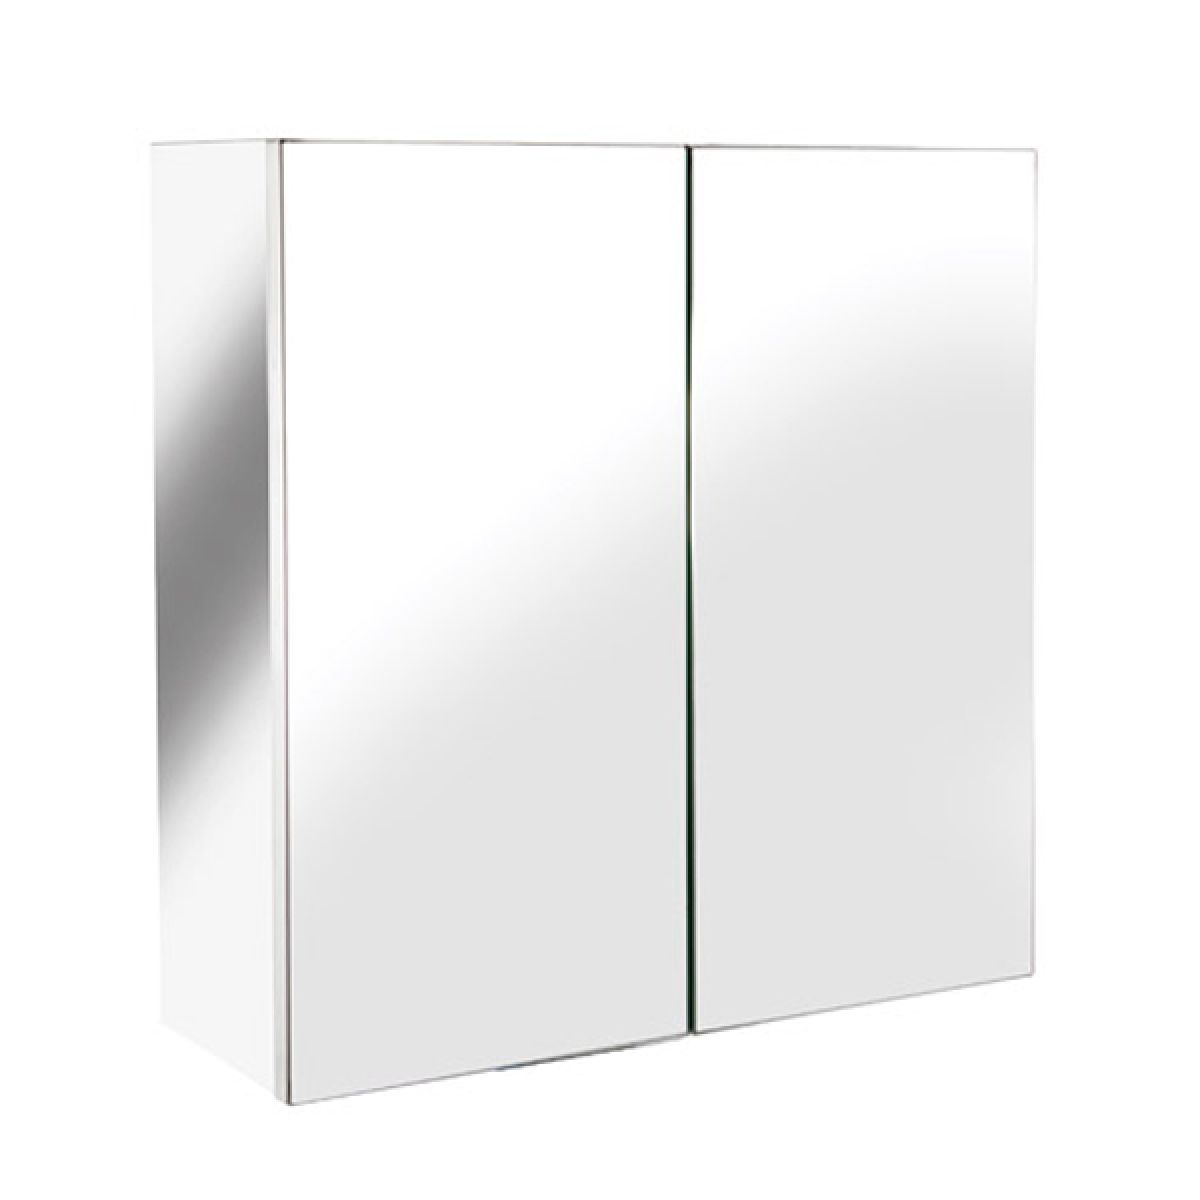 Croydex Avon Double Stainless Steel Bathroom Cabinet